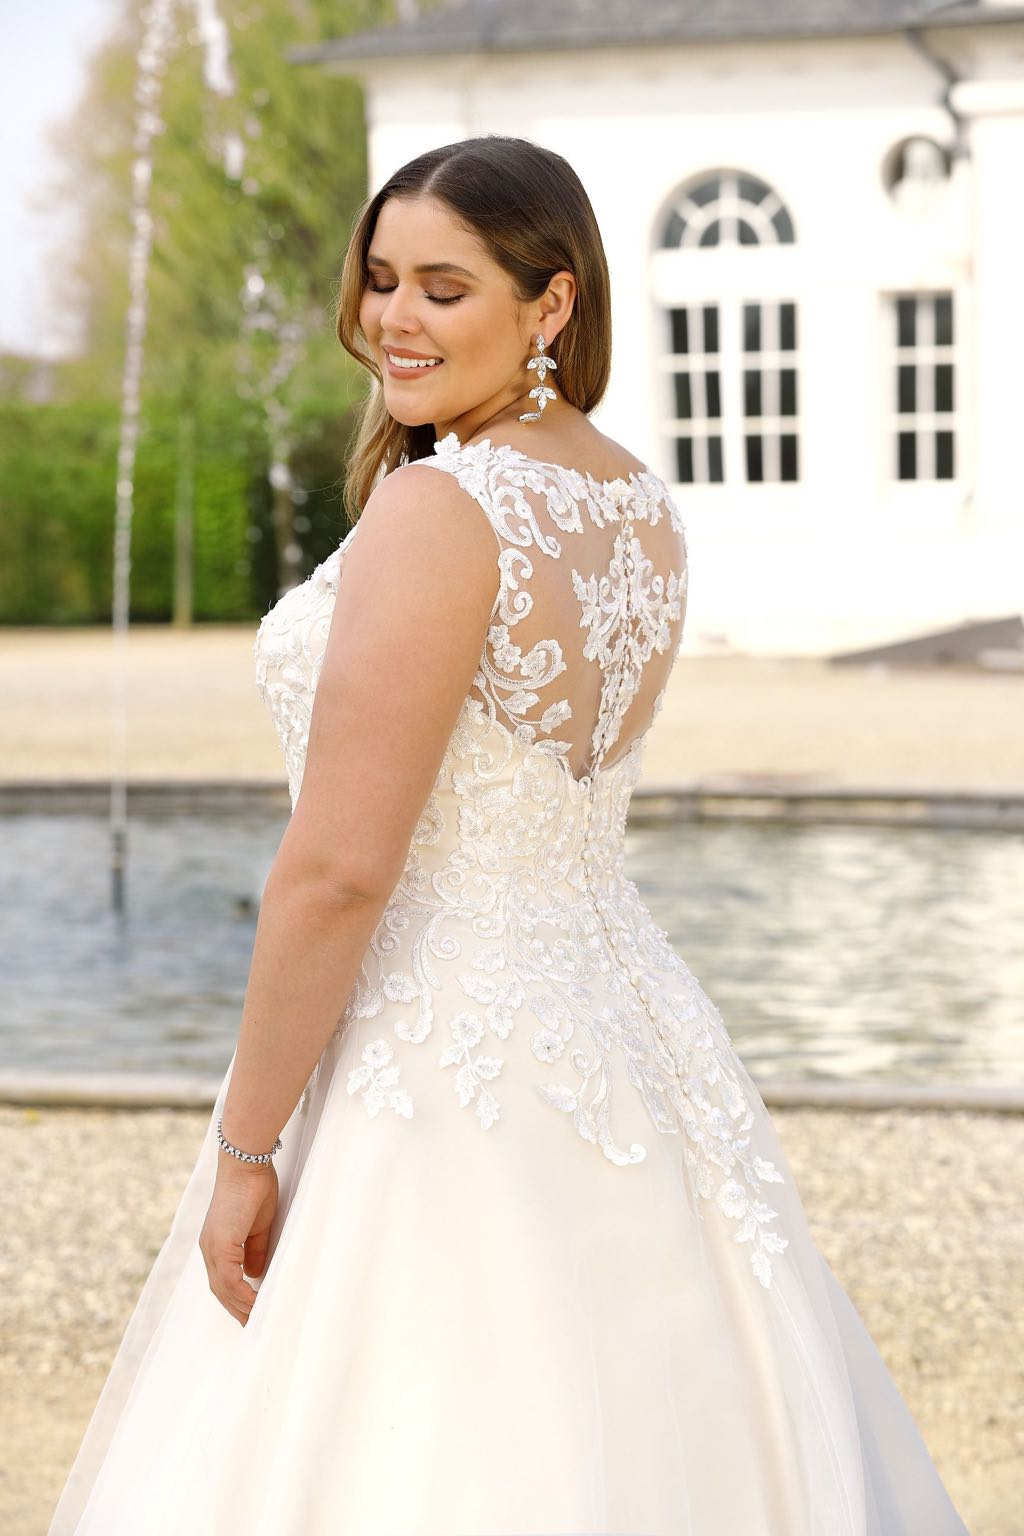 E R Wedding Fashion Bruidsmode Beverlo E R Wedding